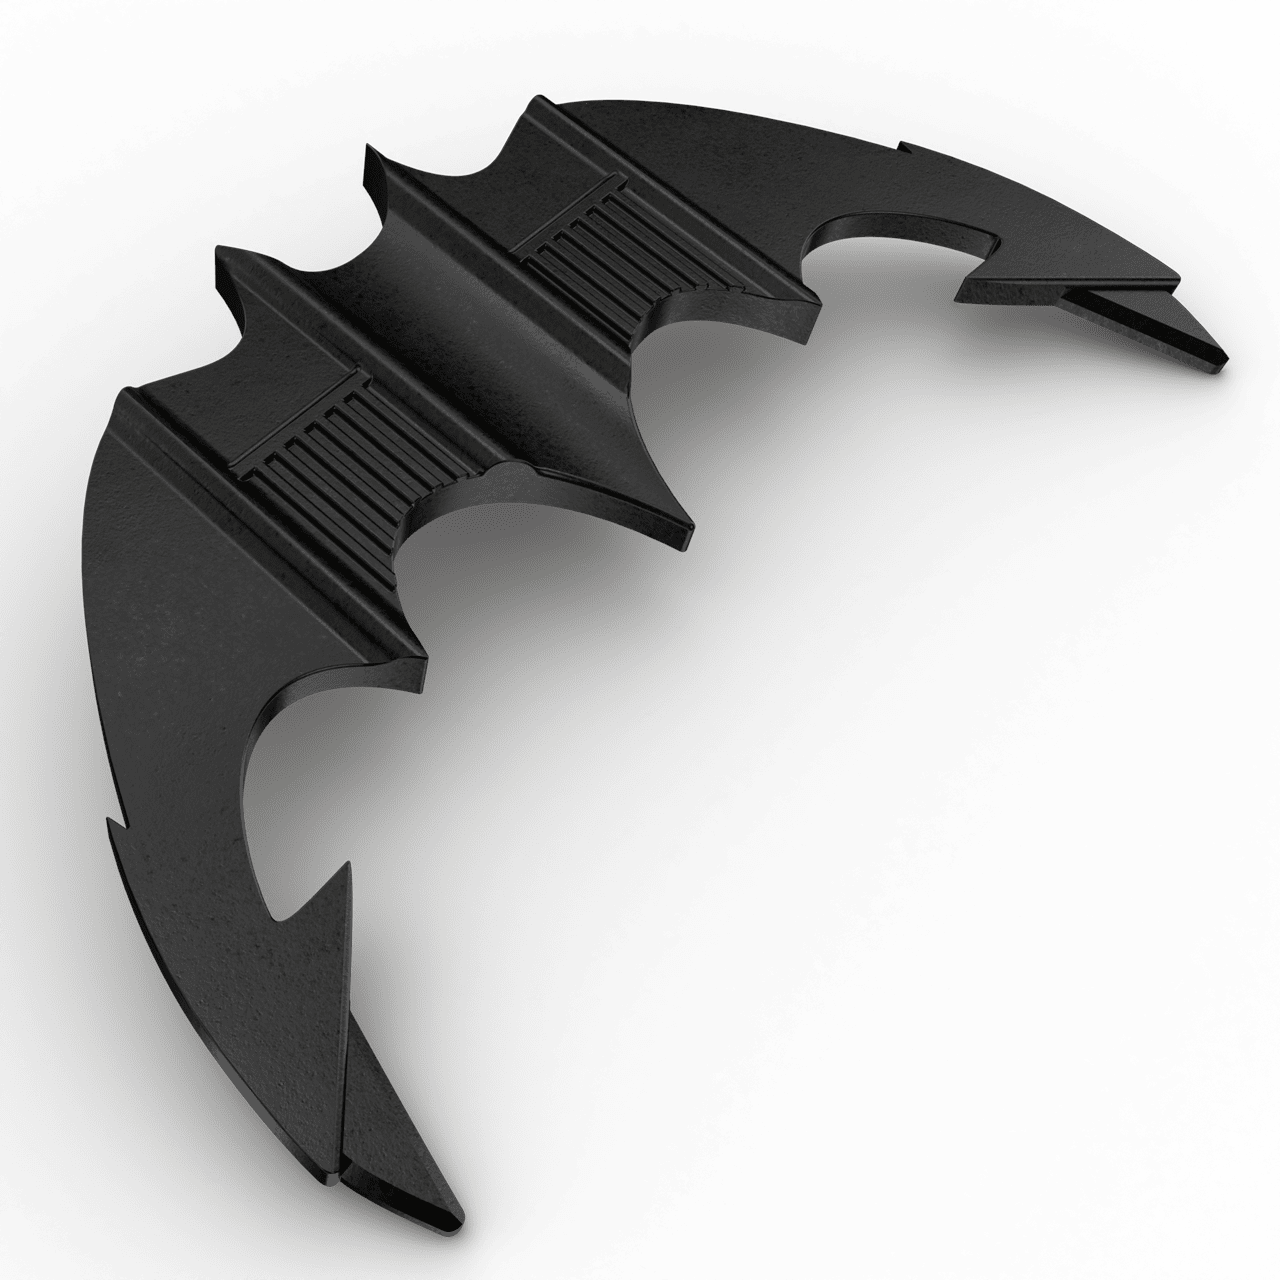 Batman Titans of Cult Limited Edition 4K Steelbook - 3